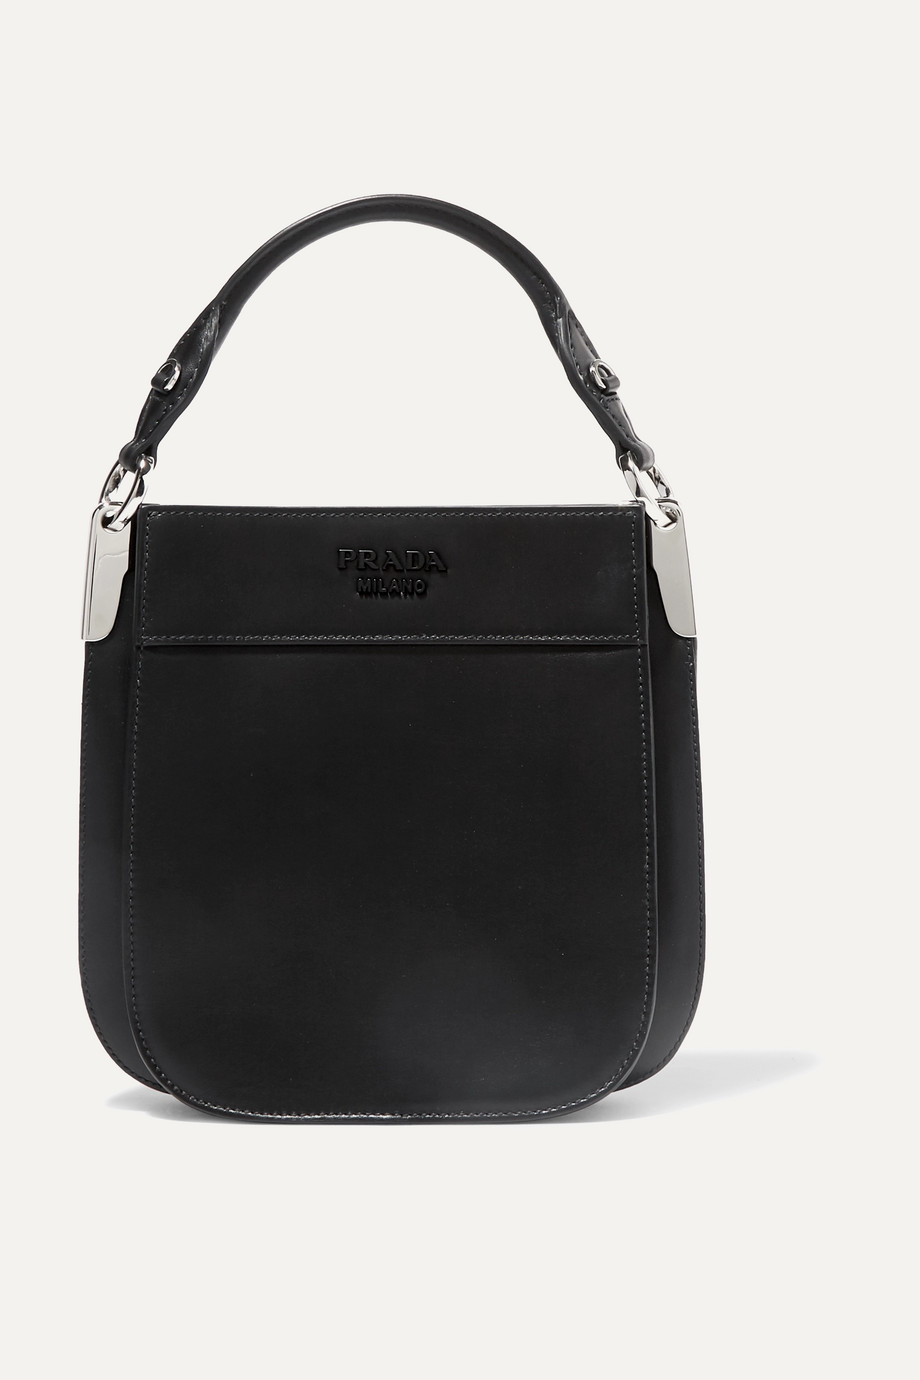 Prada Margit small leather tote